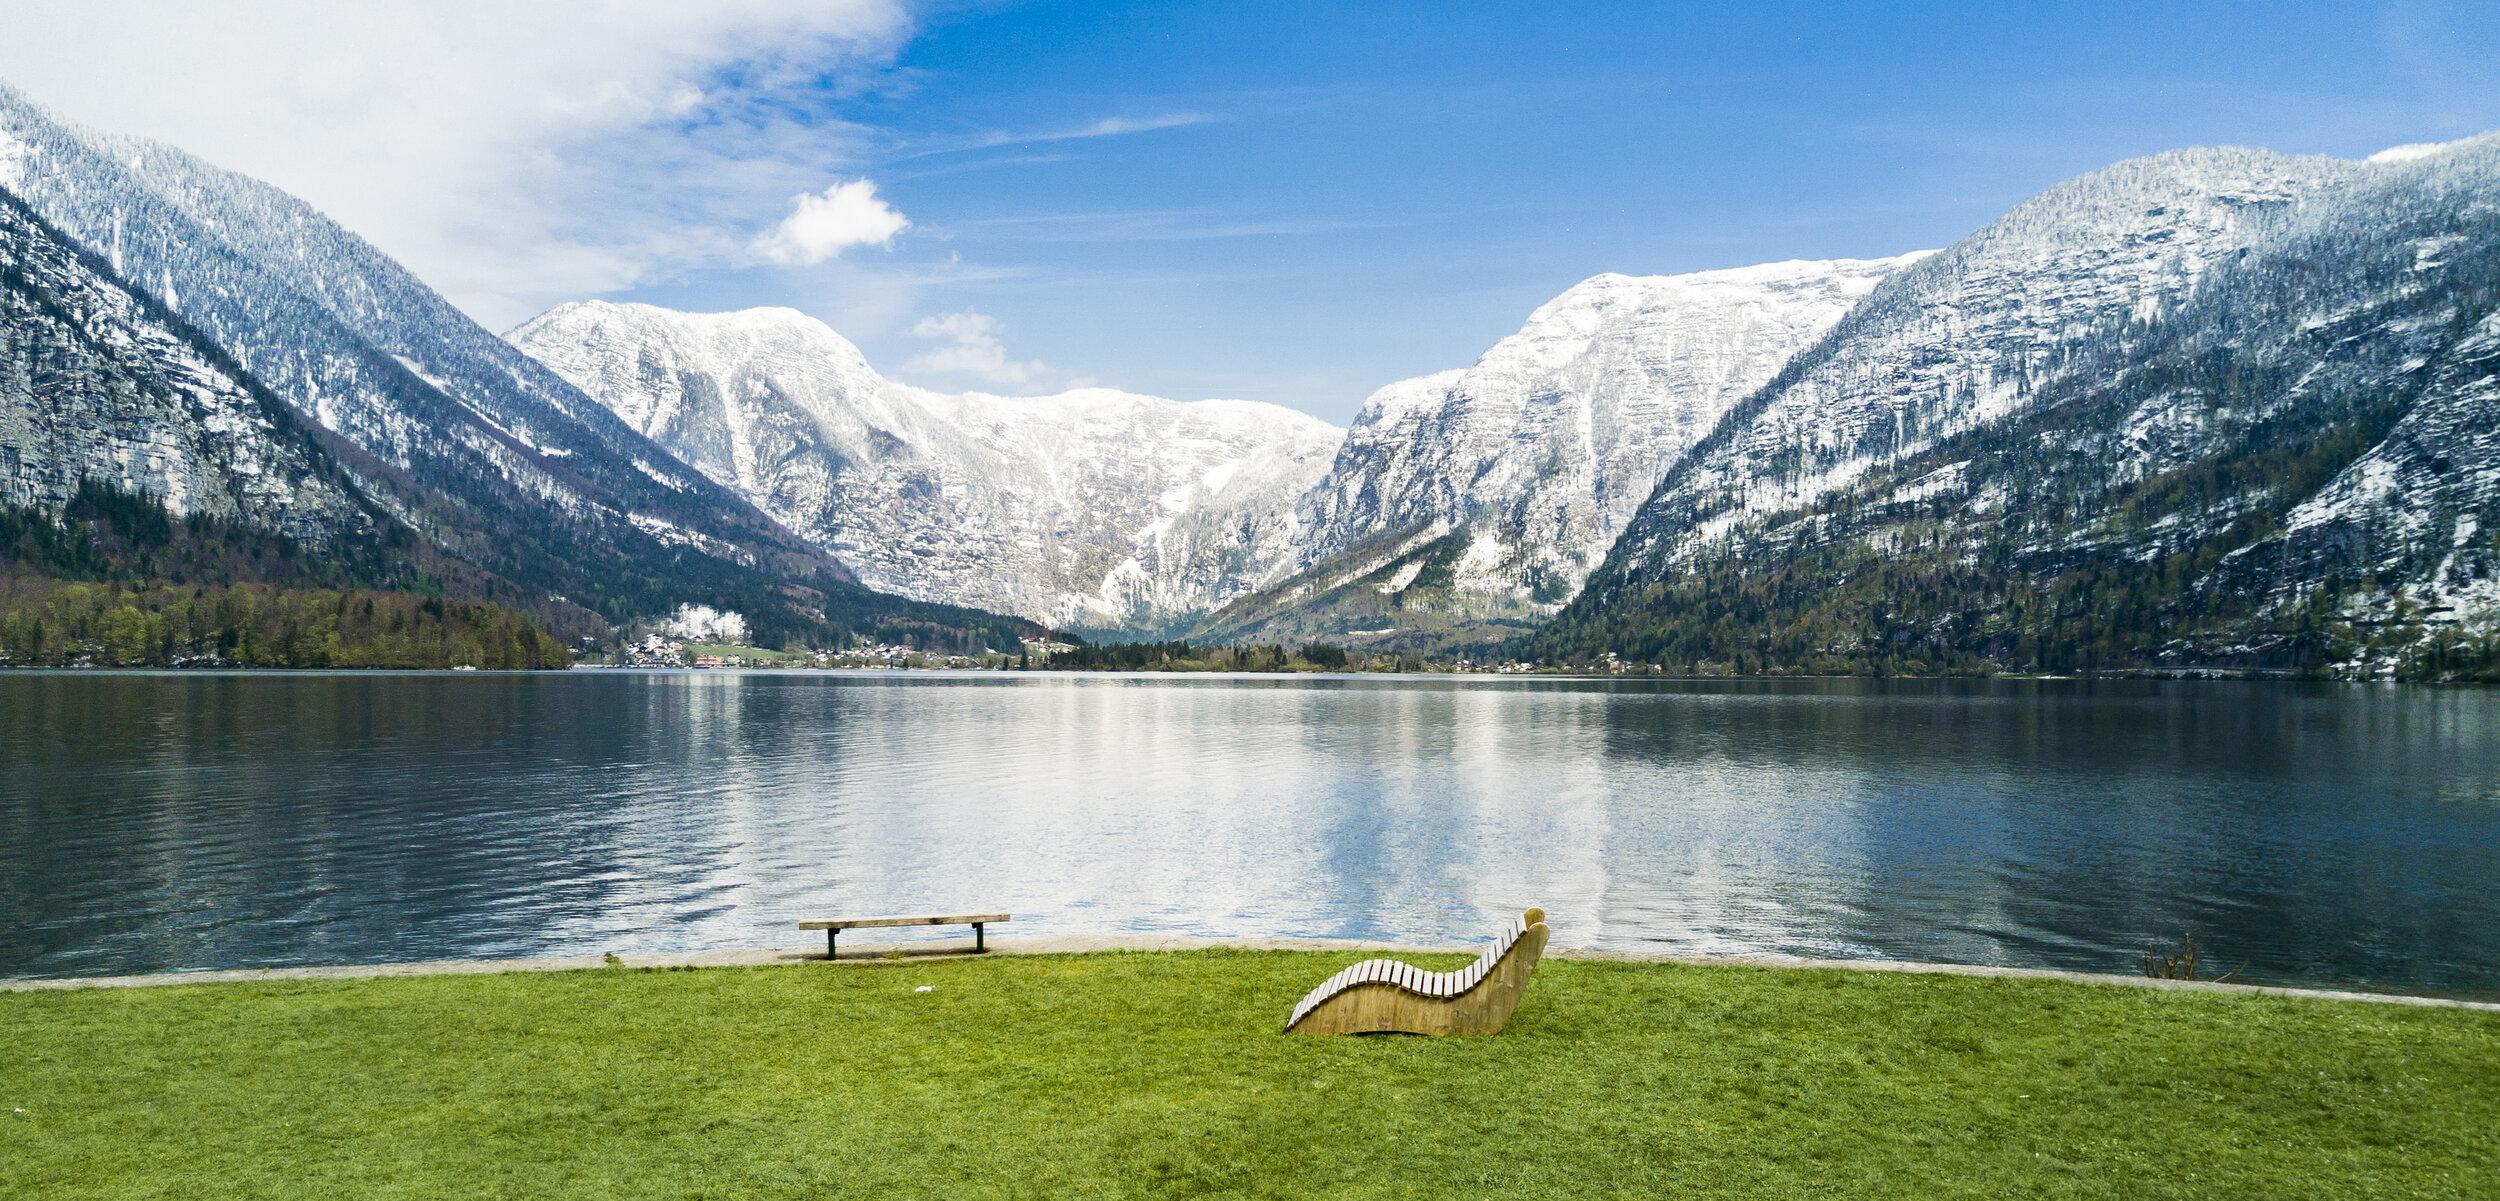 View of the lake from Hallstatt